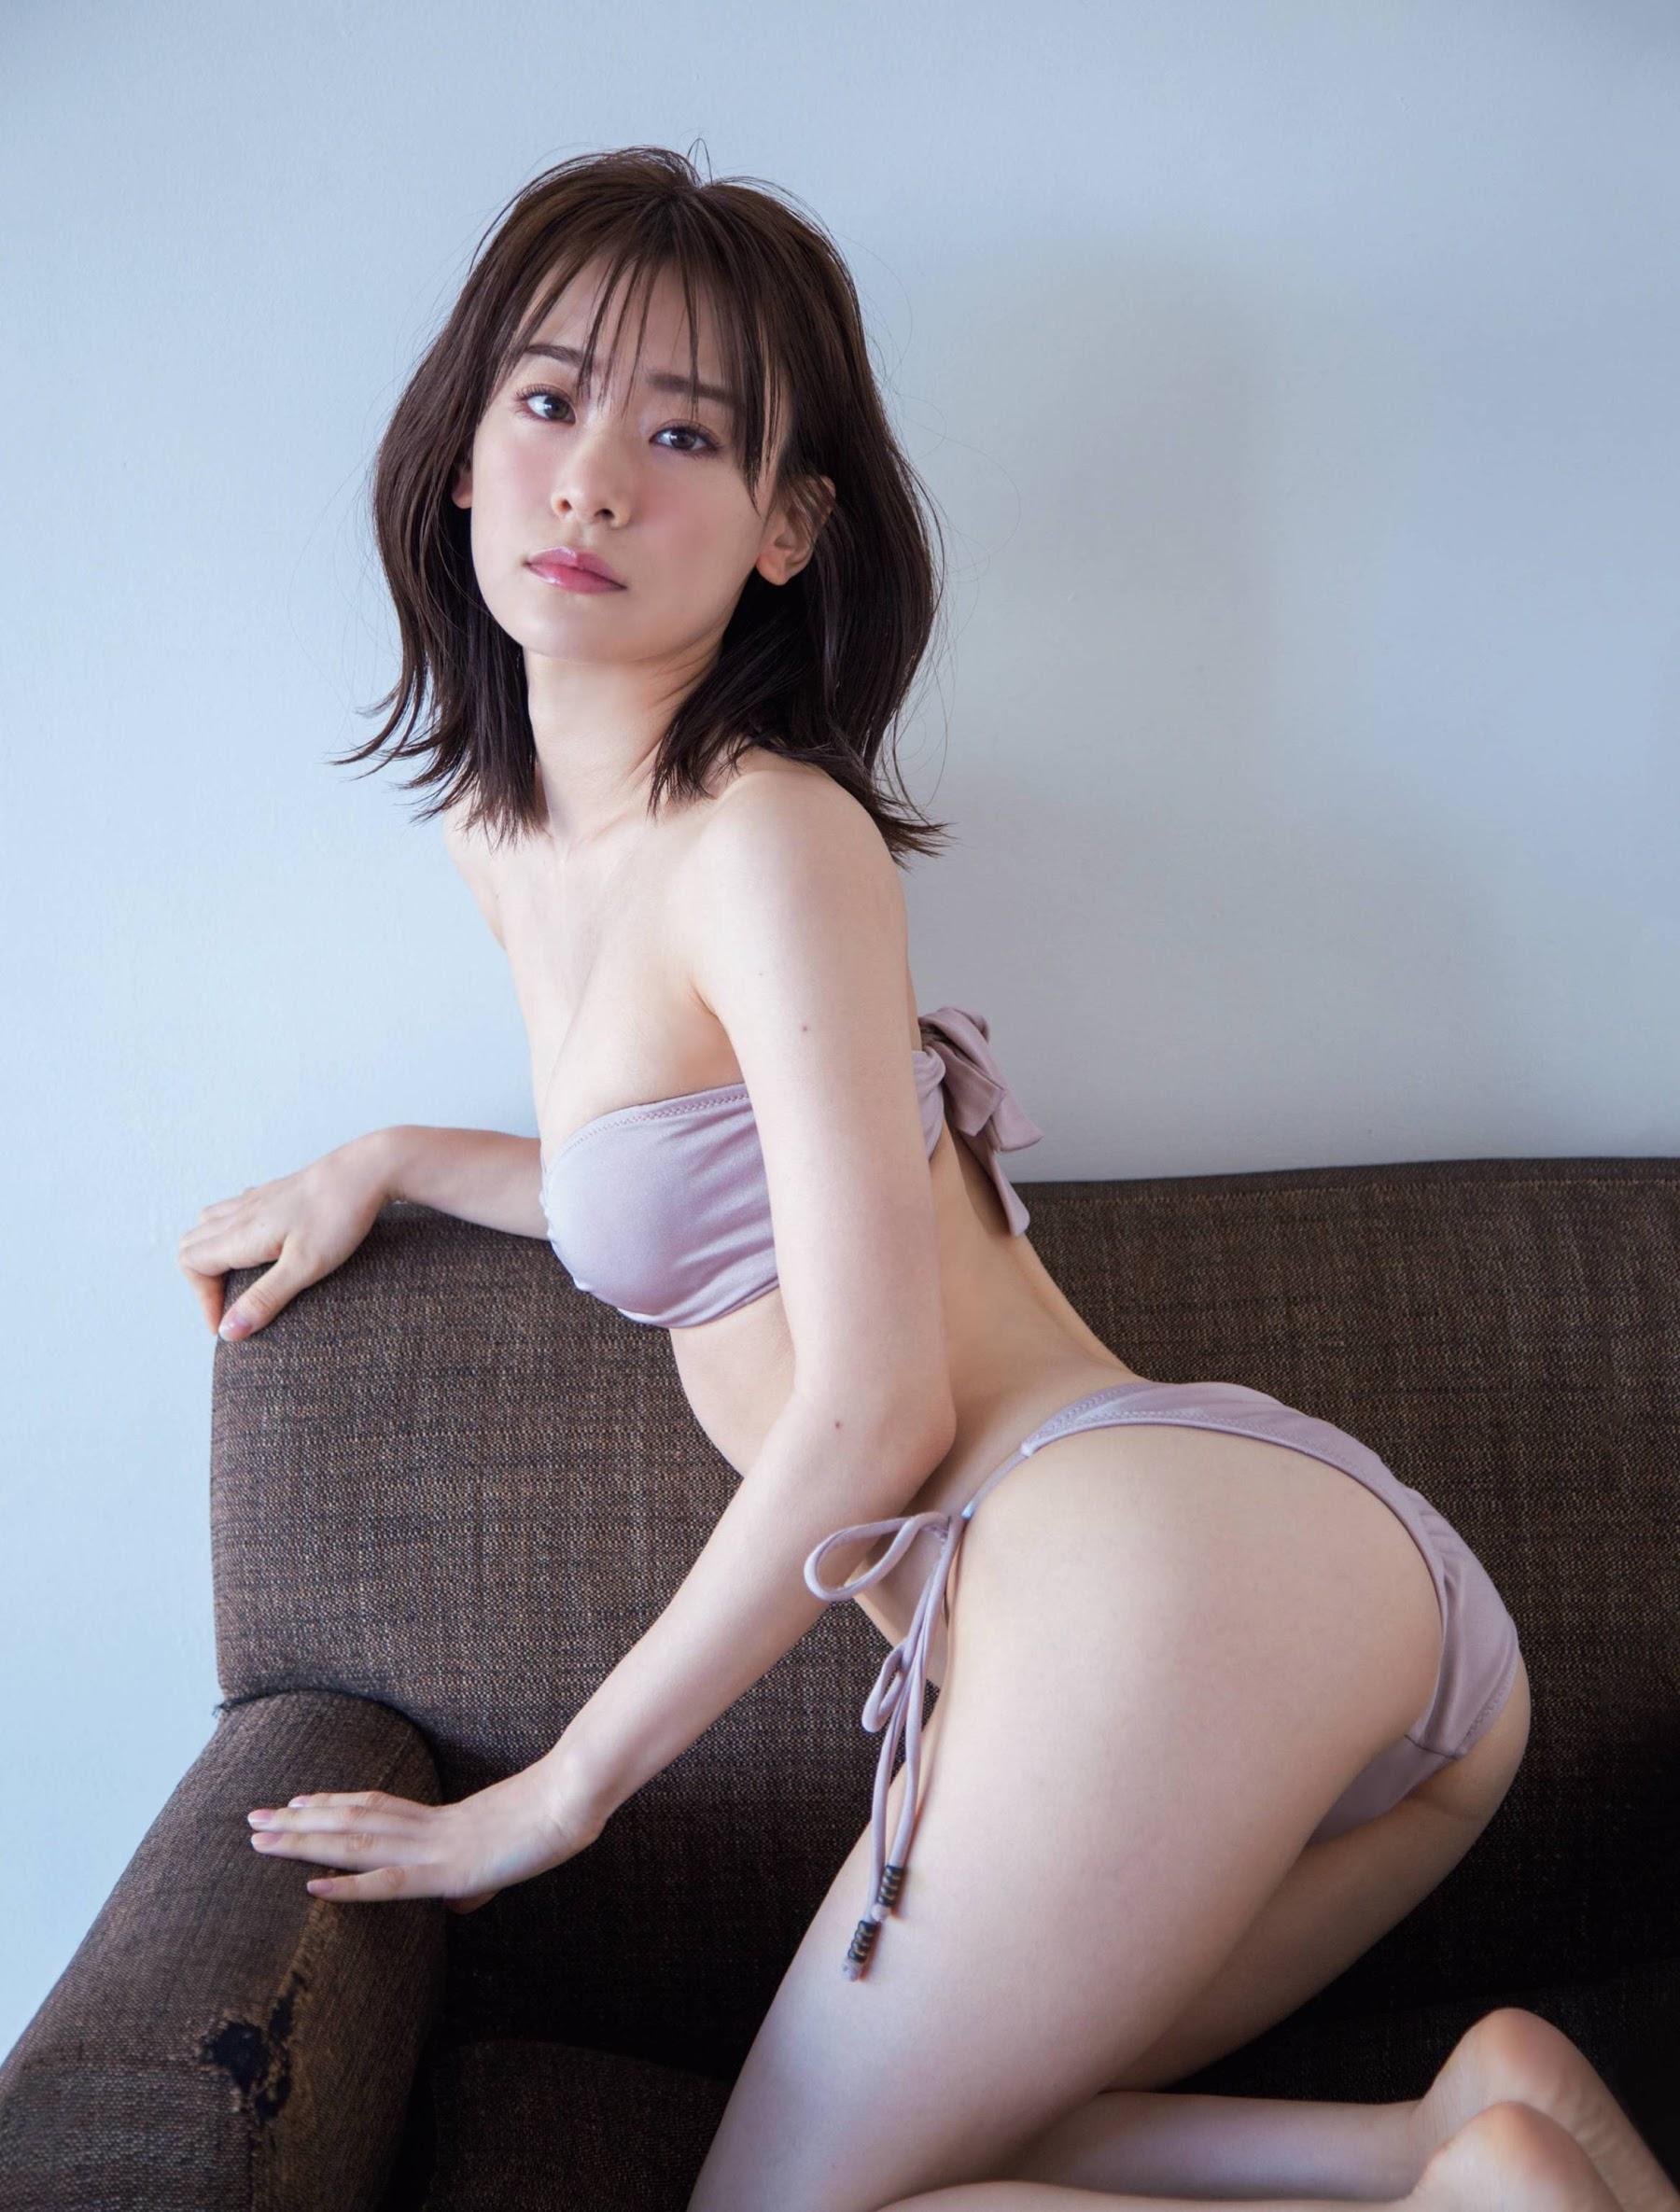 Newcomer in the gravure world who graduated from Tokyo University of Science Minami Fukuoka Swimsuit gravure bikini beauty BODY Rikejo 2020003